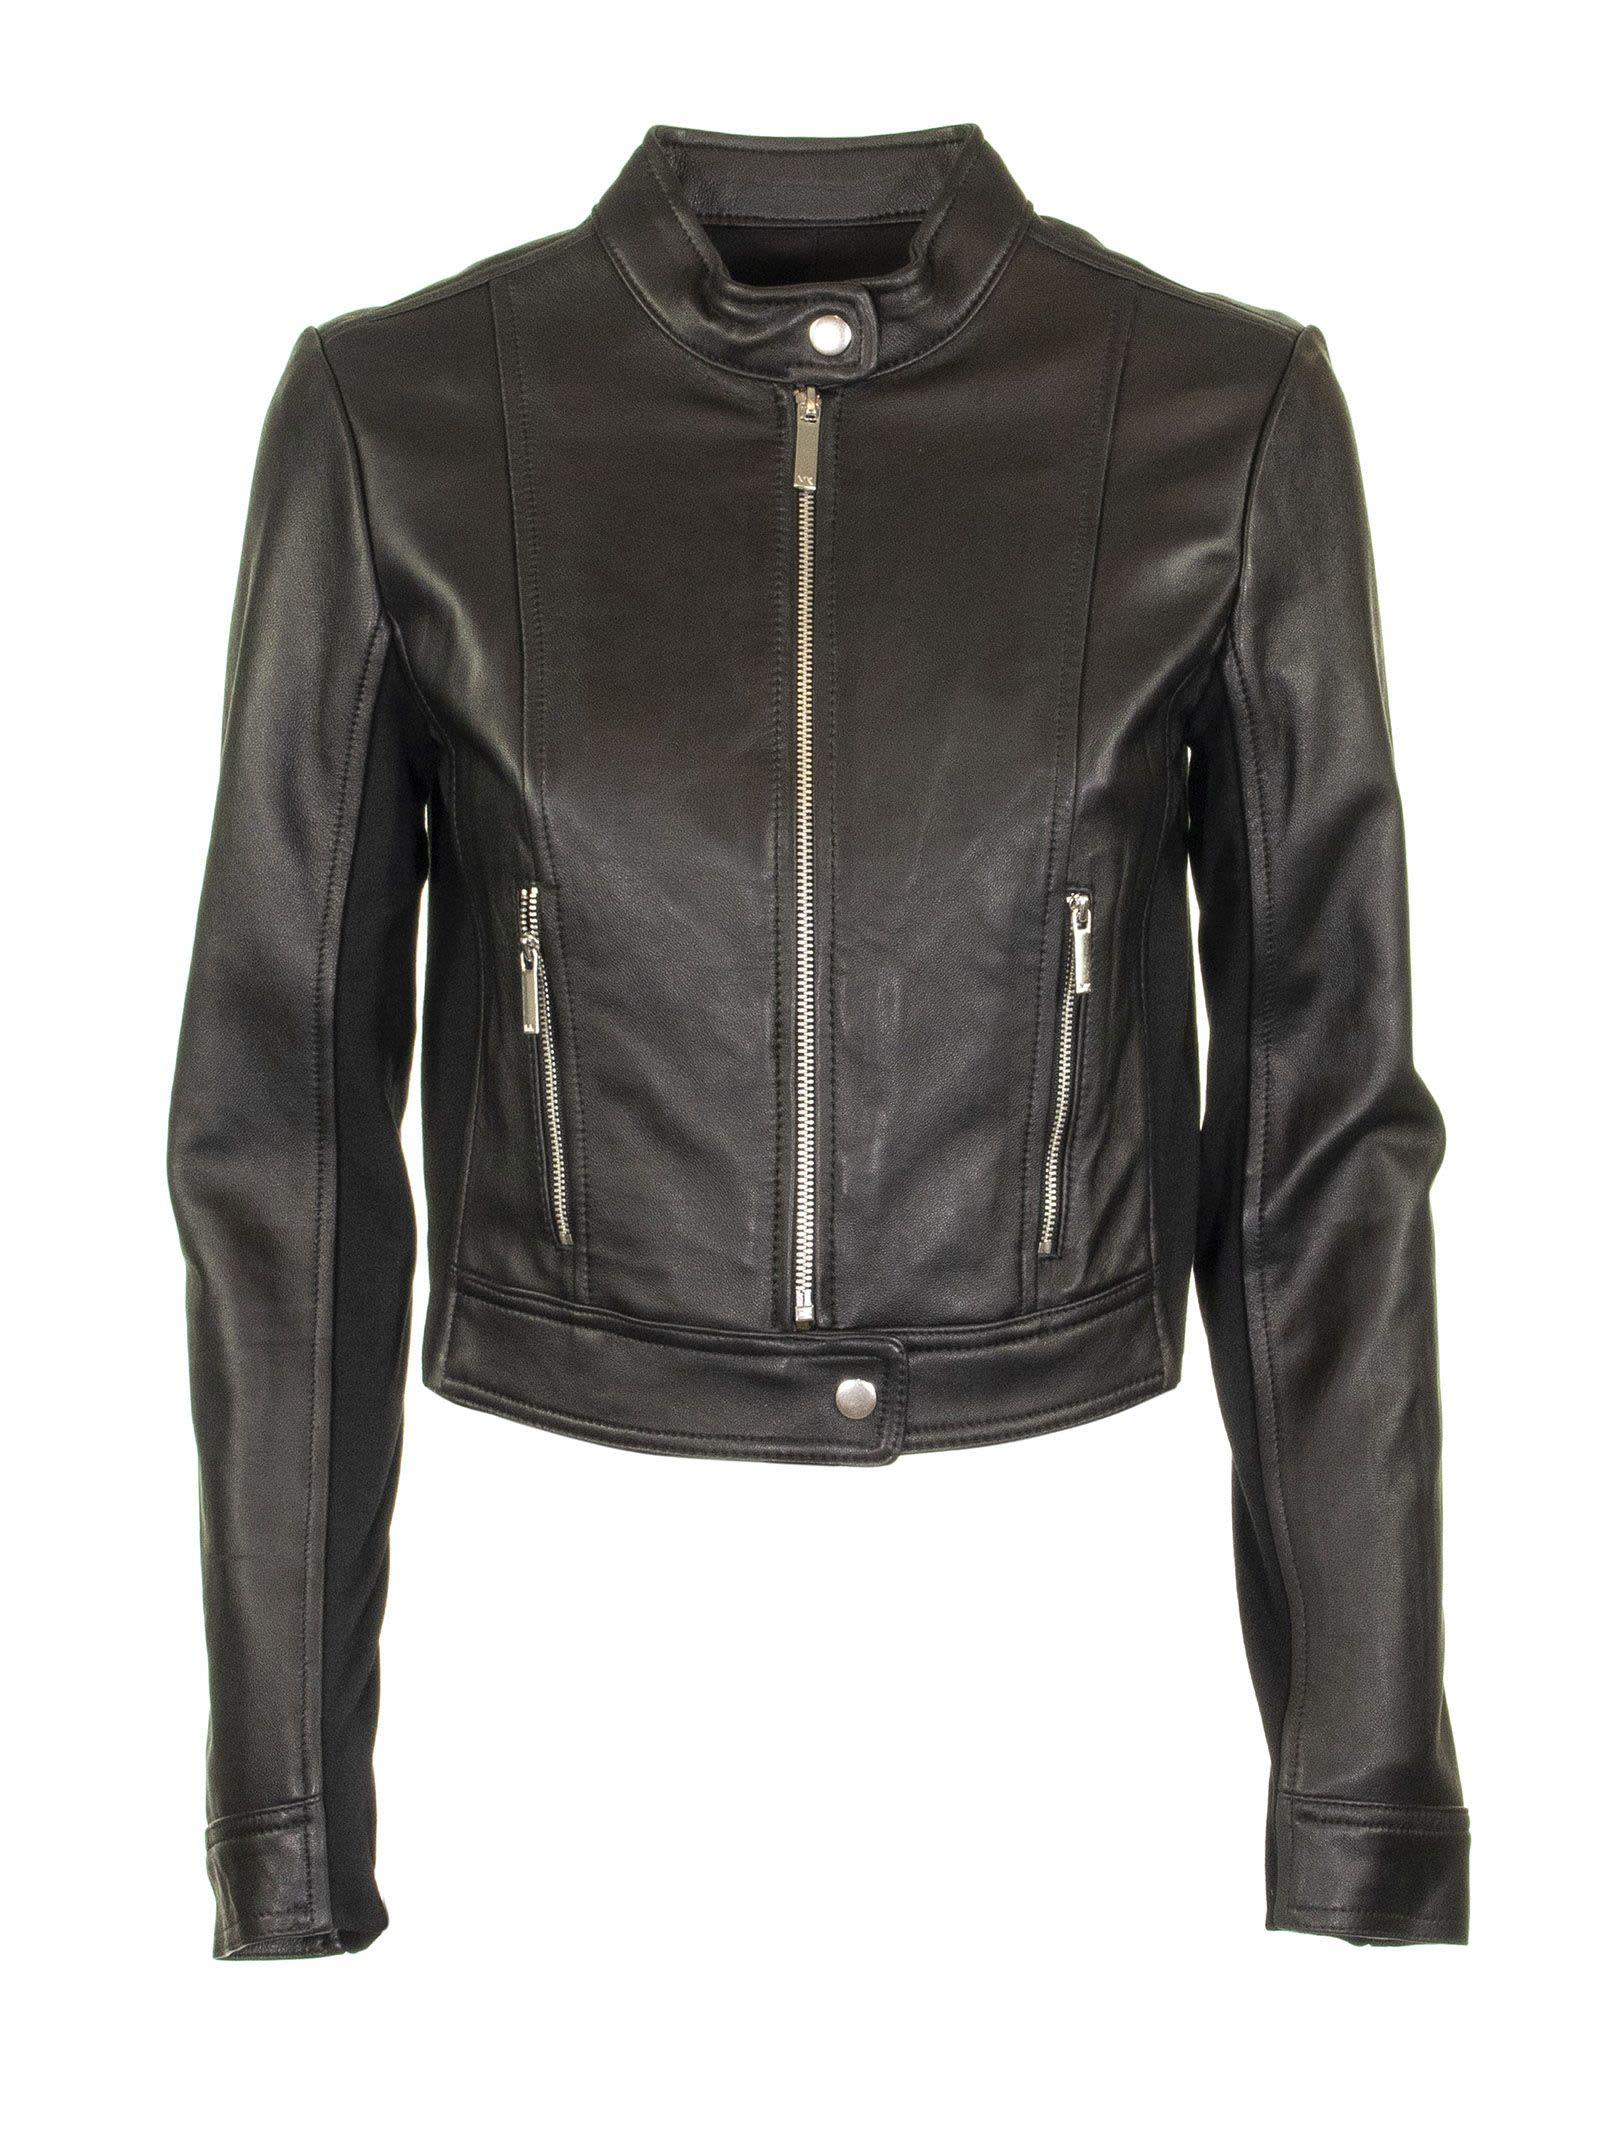 Photo of  Michael Kors Leather Jacket Black- shop Michael Kors jackets online sales